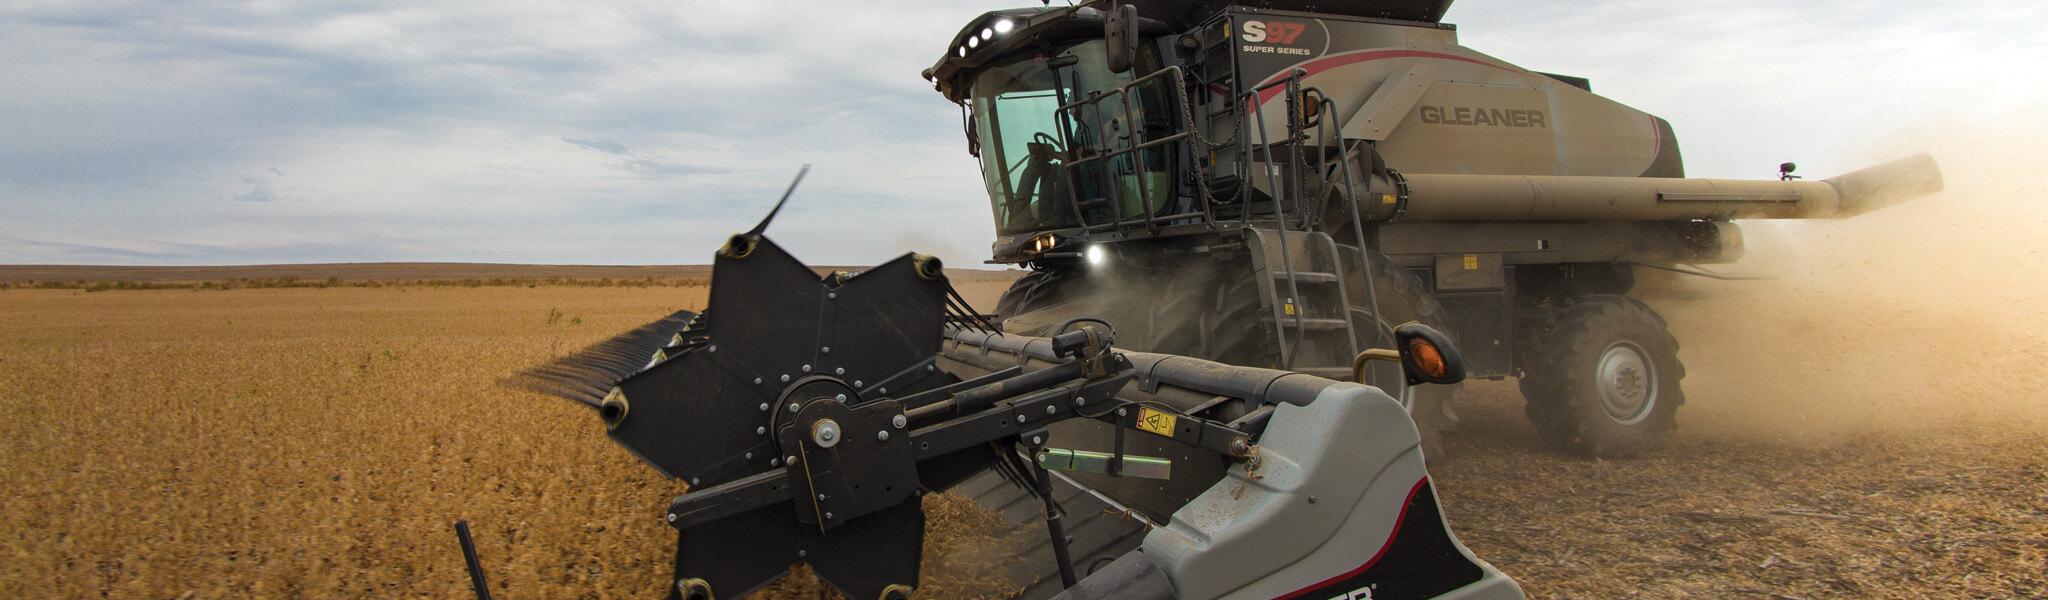 Parkland Farm Equipment   Tractor Dealers North Battleford   Home